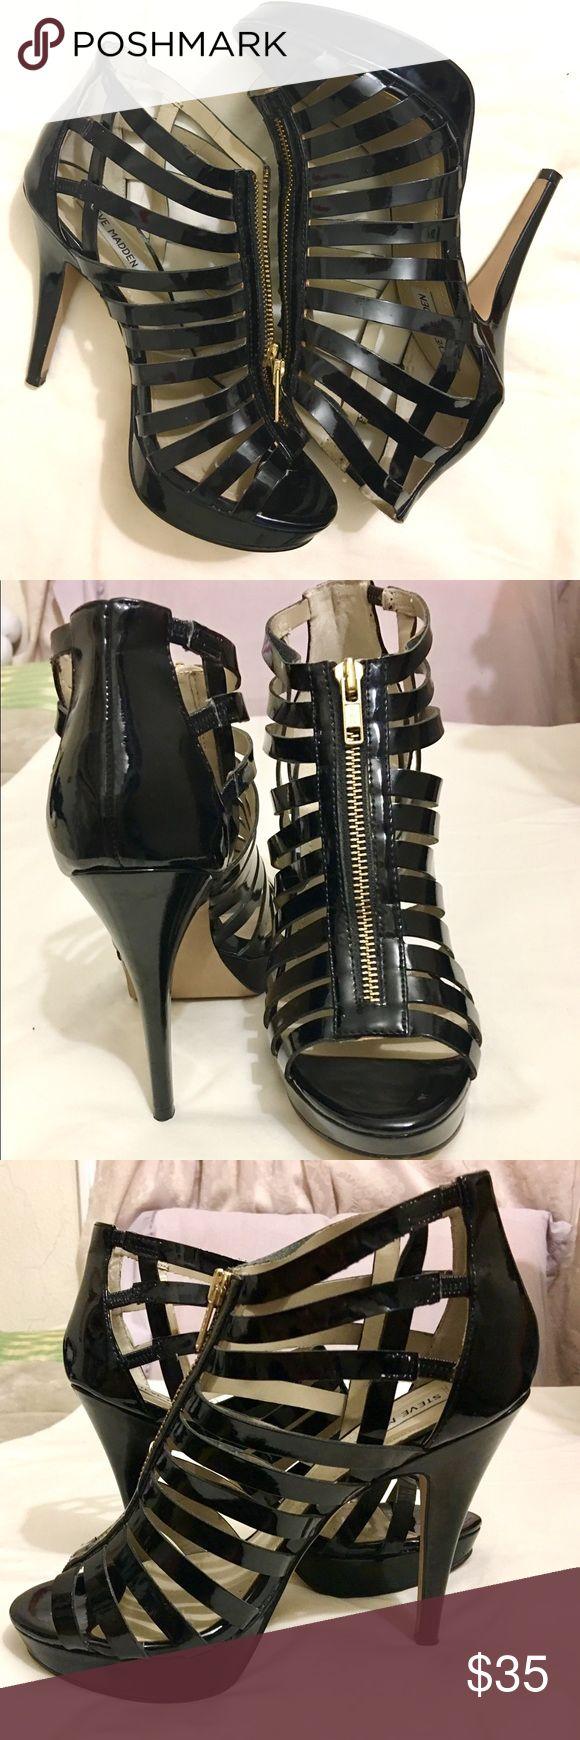 Steve Madden stiletto heels Steve Madden 'Nanciee' black heels with gold zipper. Only worn twice. Platform is 3/4 inches. Heel is 4.5-5 inches. Over 50% off original! Steve Madden Shoes Heels